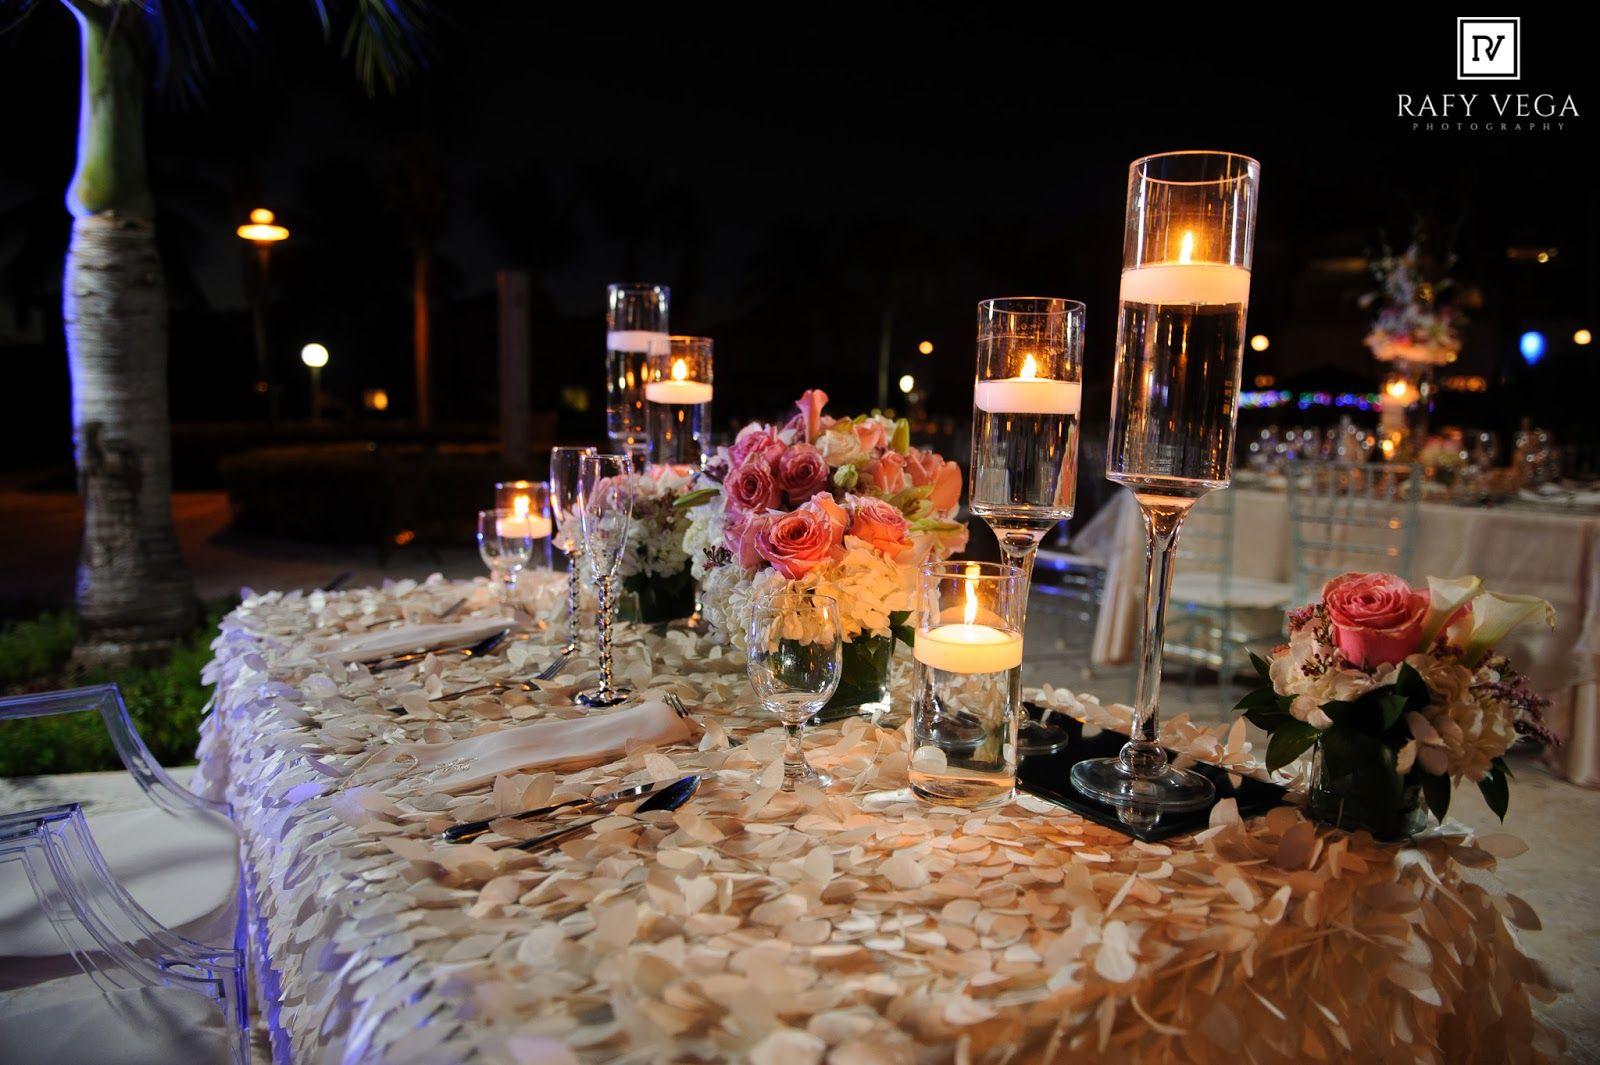 Rafy Vega Photography Fotografo De Bodas Wedding Photographer Ponce Puerto Rico Crissel Juan Orlando Santa Maria Rein Santa Maria Table Decorations Wedding